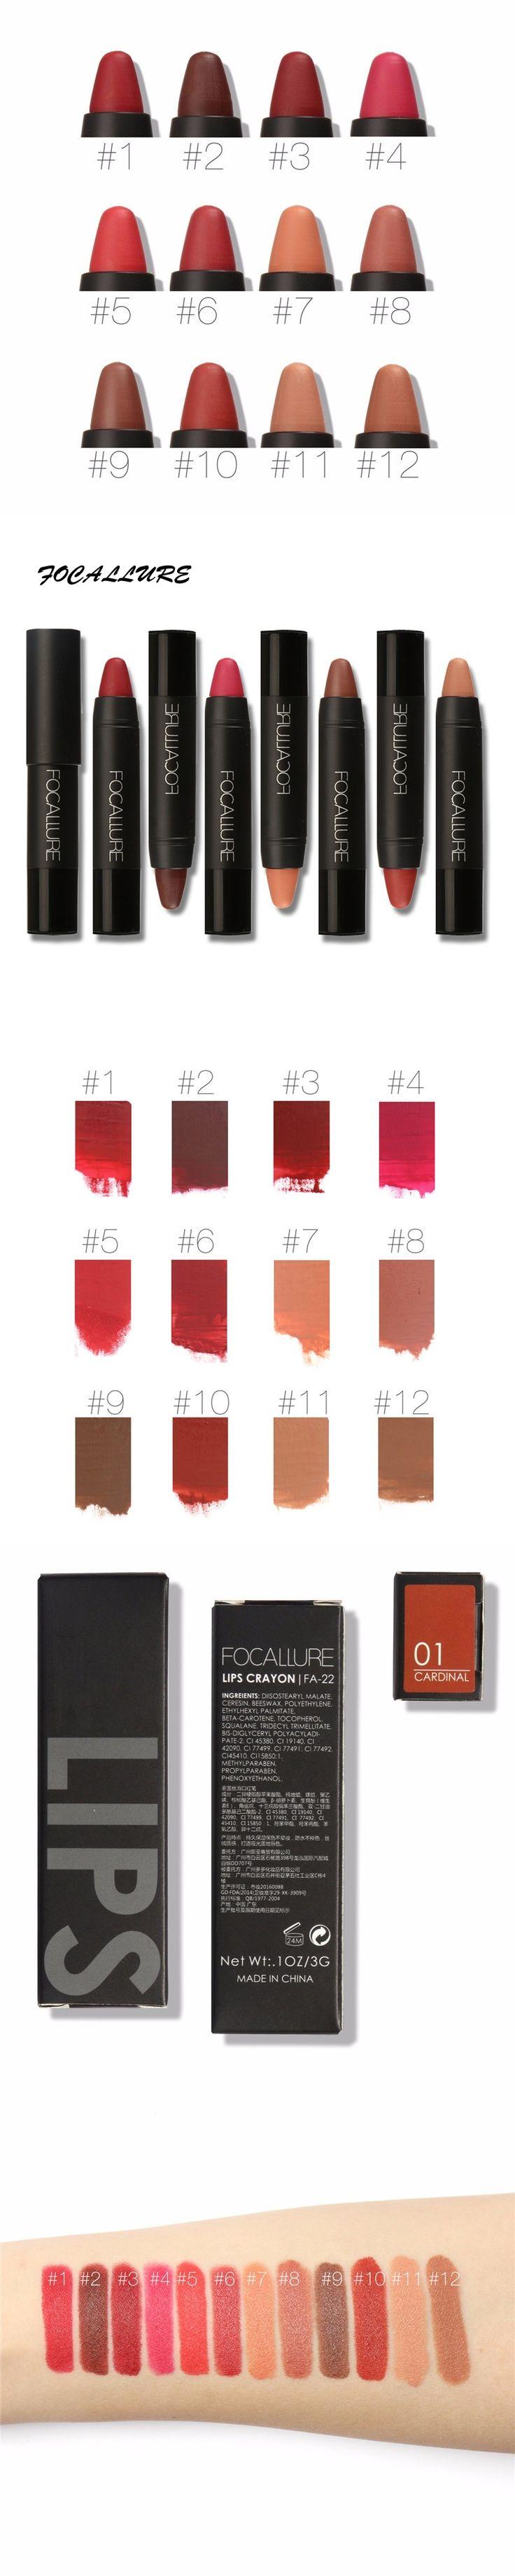 FOCALLURE Cosmetics Matte Lipstick High Gloss Lip Make Up Lips Crayons 24 hours Long Lasting Nude Women Waterproof Lipsticks